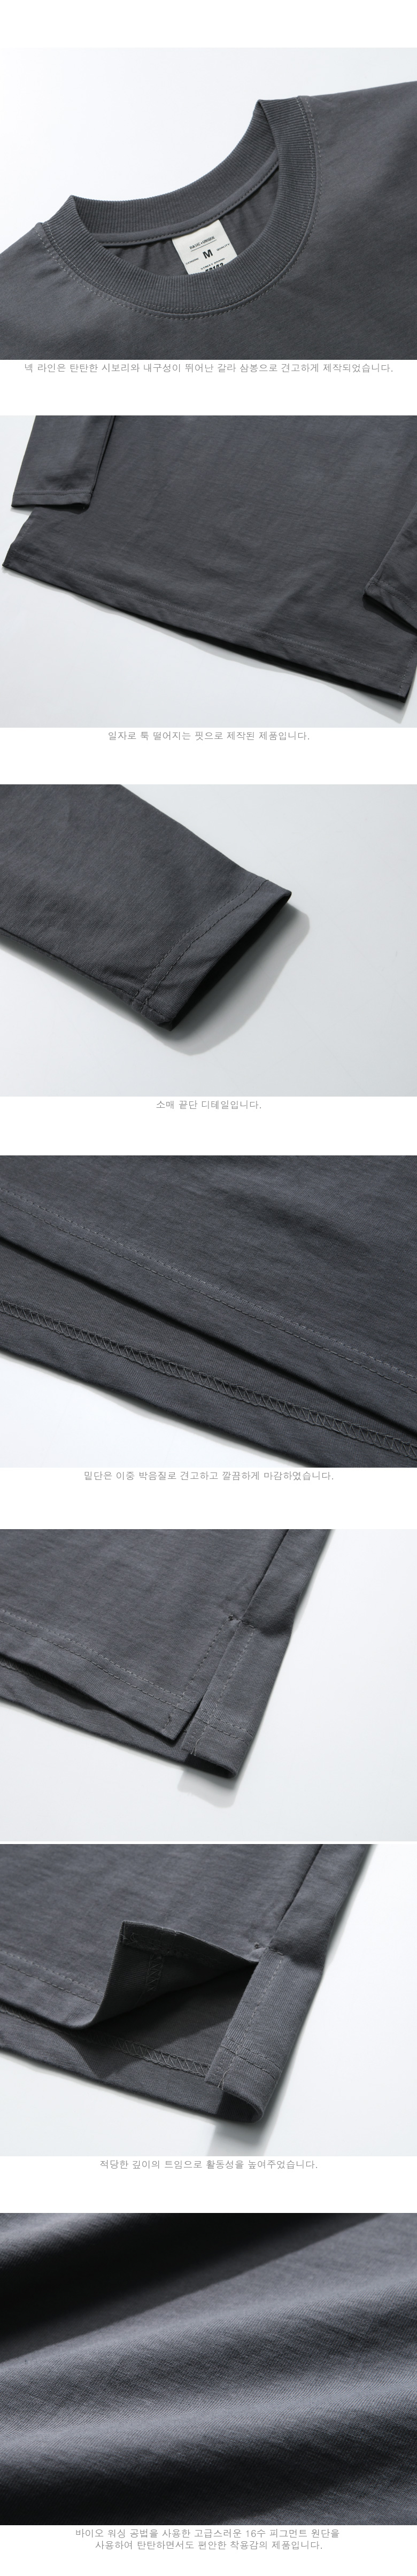 20190225_fp_pigmentlong_charcoal_02.jpg